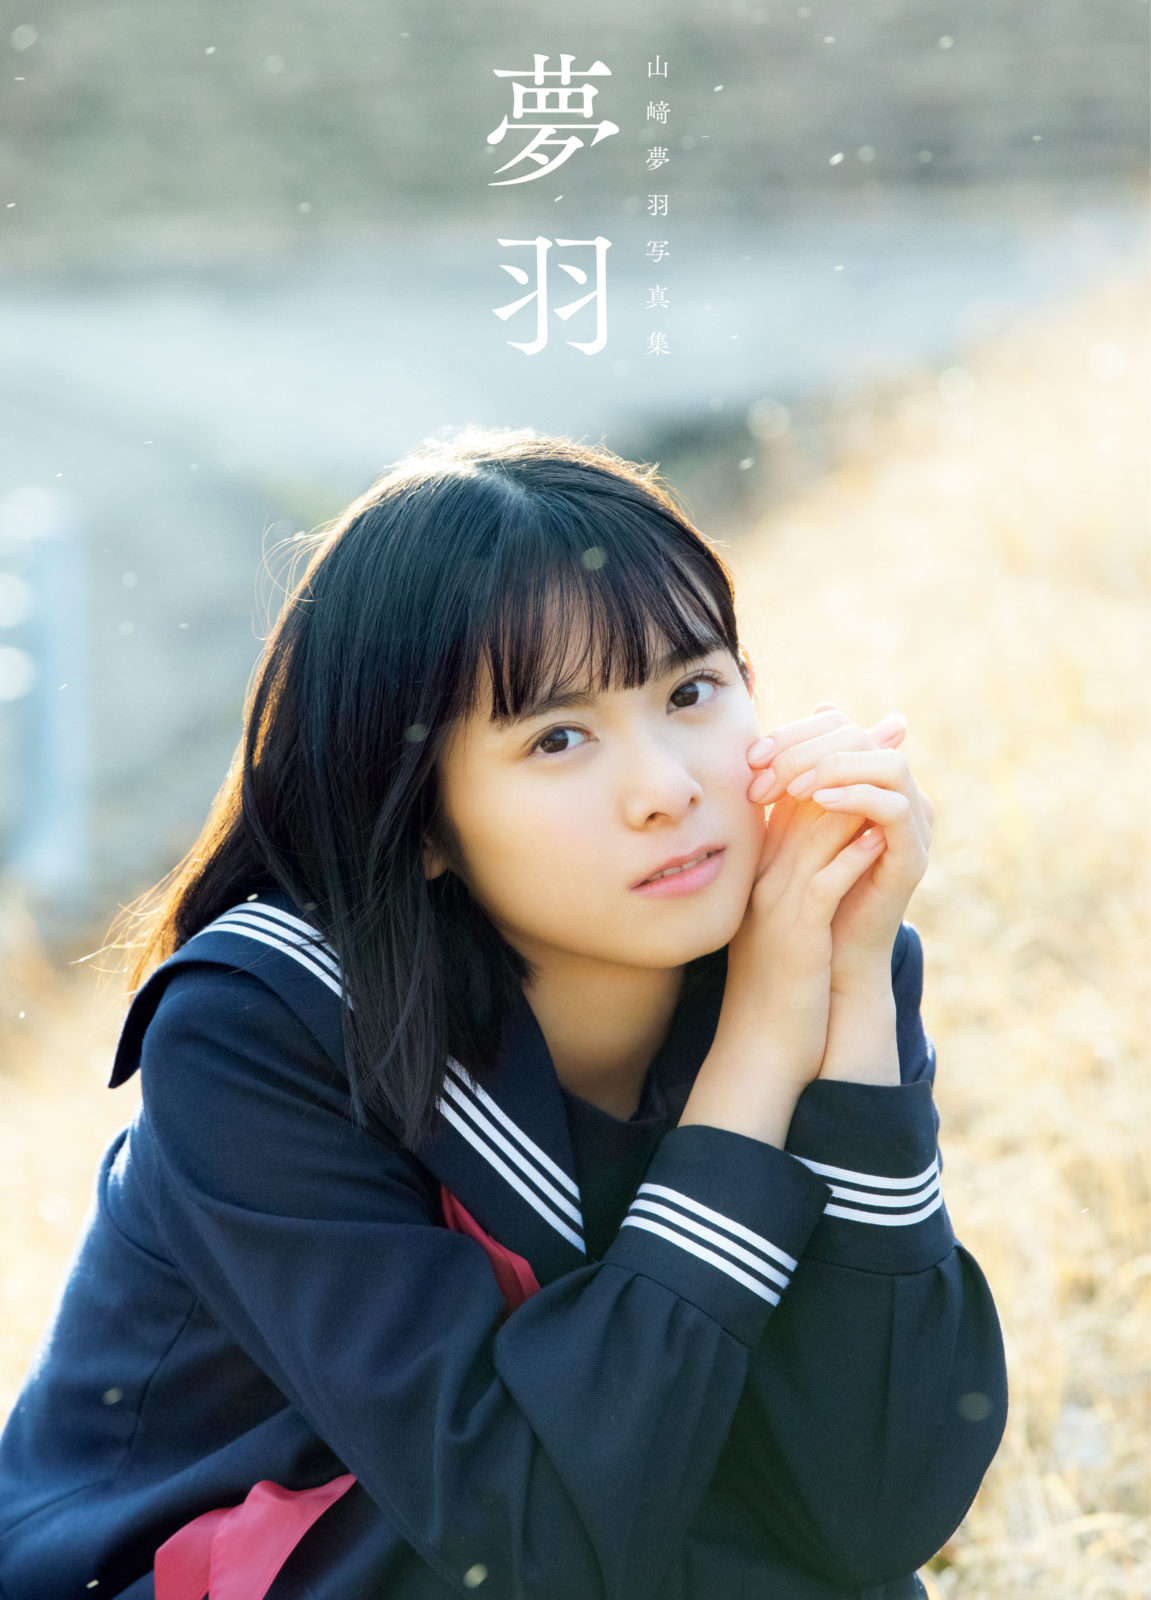 BEYOOOOONDSのエース・山崎夢羽、初めての写真集リリースサムネイル画像